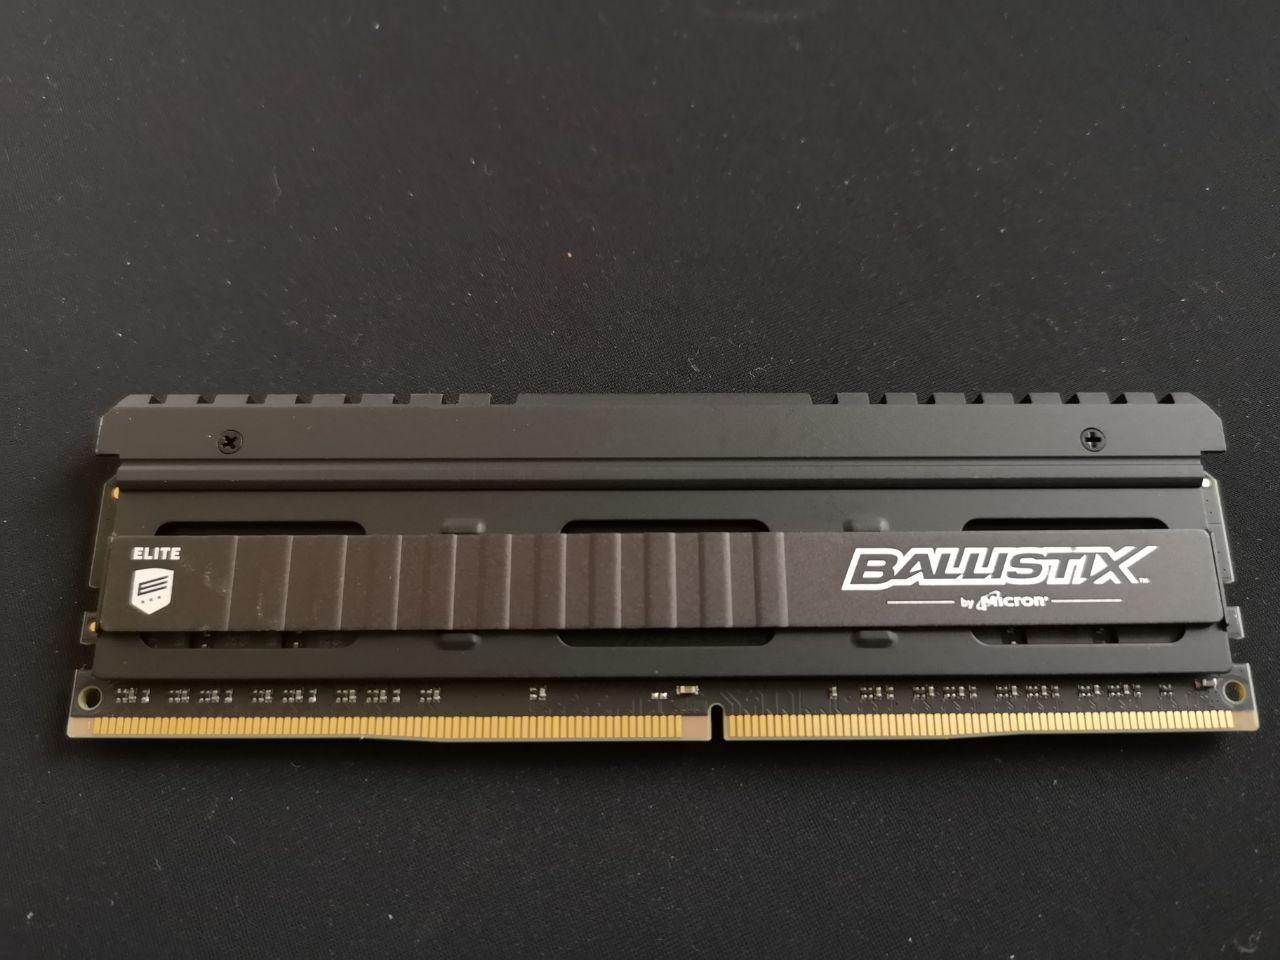 Ballistix Elite DDR4, la ram per i gamer! 3